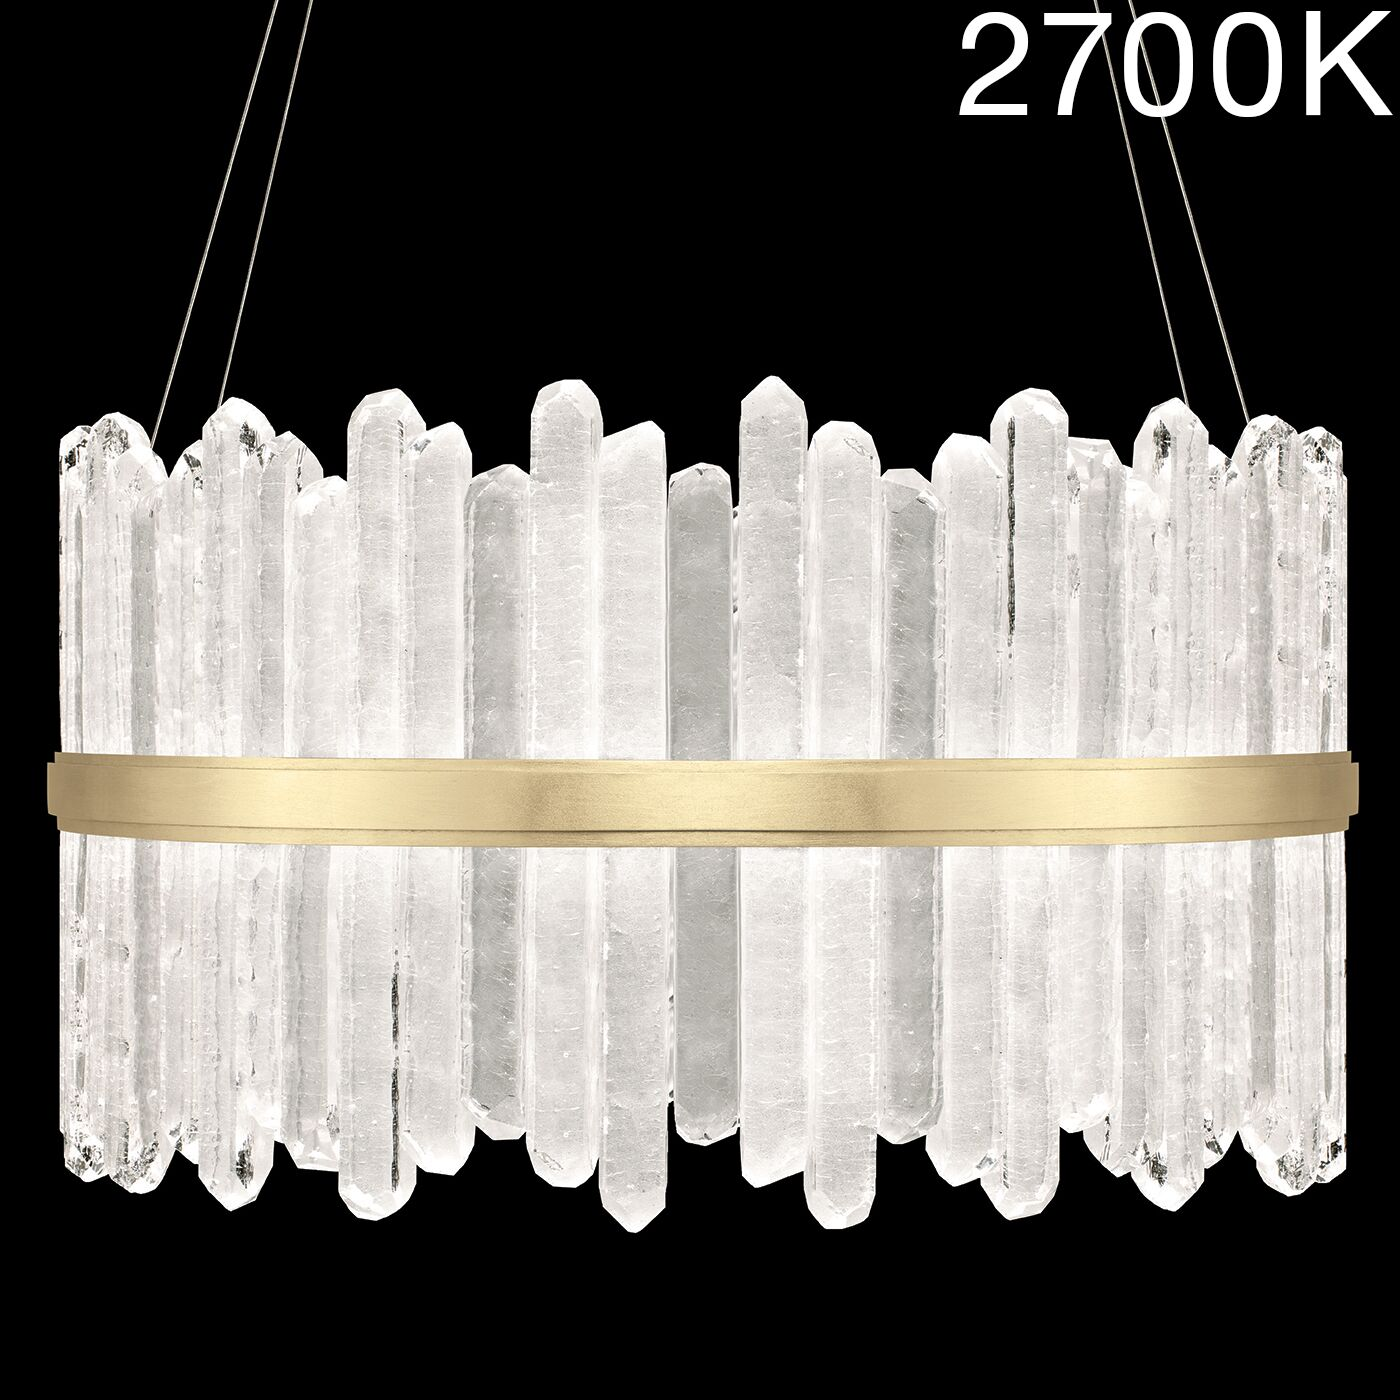 Lior Rock 48-Light Drum Chandelier Color Temperature: 2700, Finish: Gold